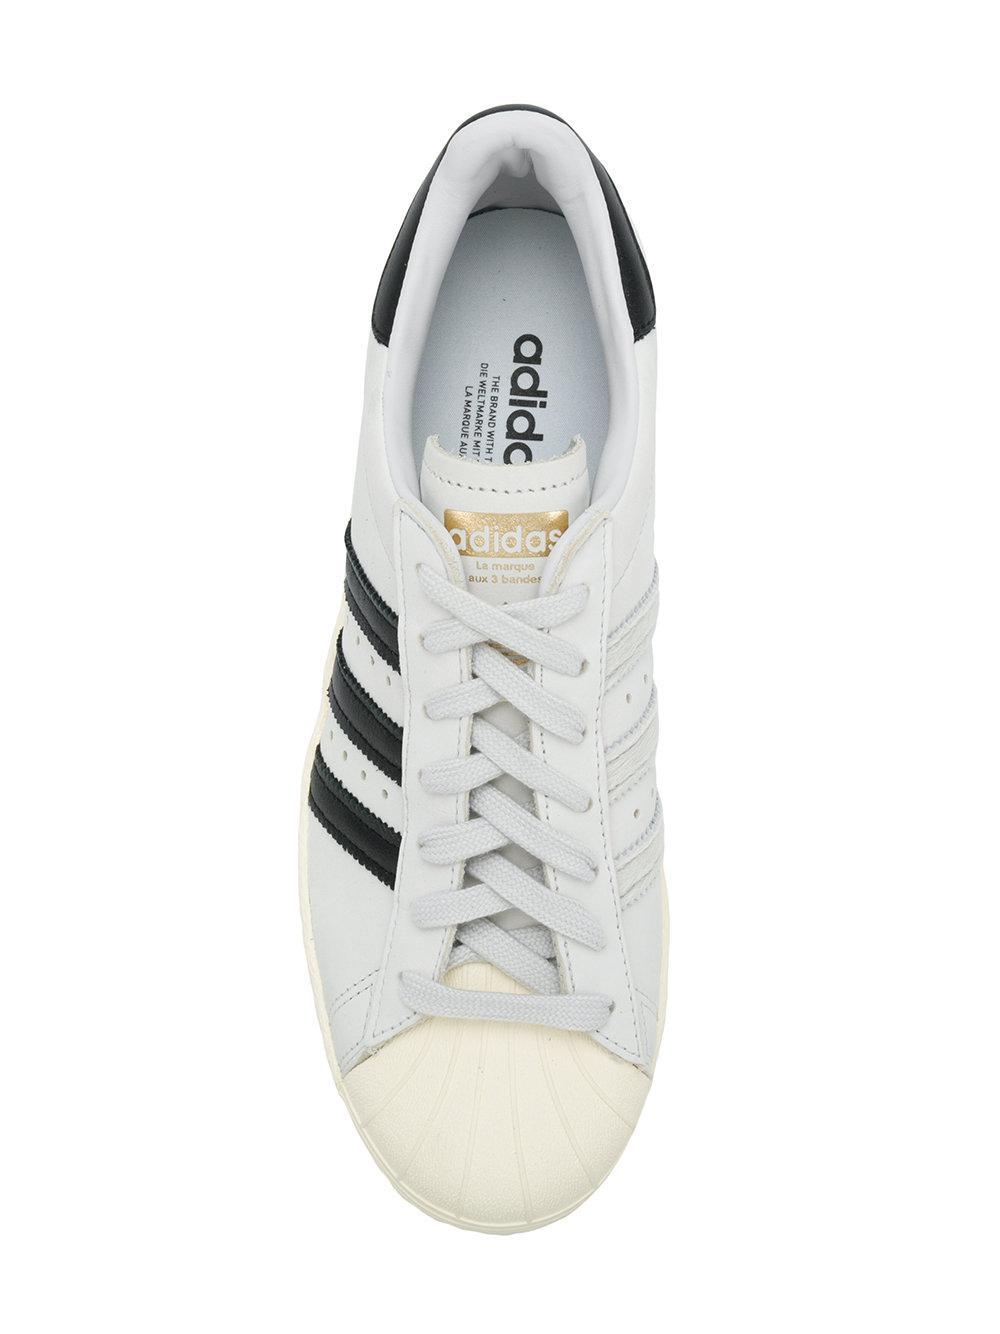 Lyst adidas superstar degli anni '80 le scarpe da ginnastica in bianco.